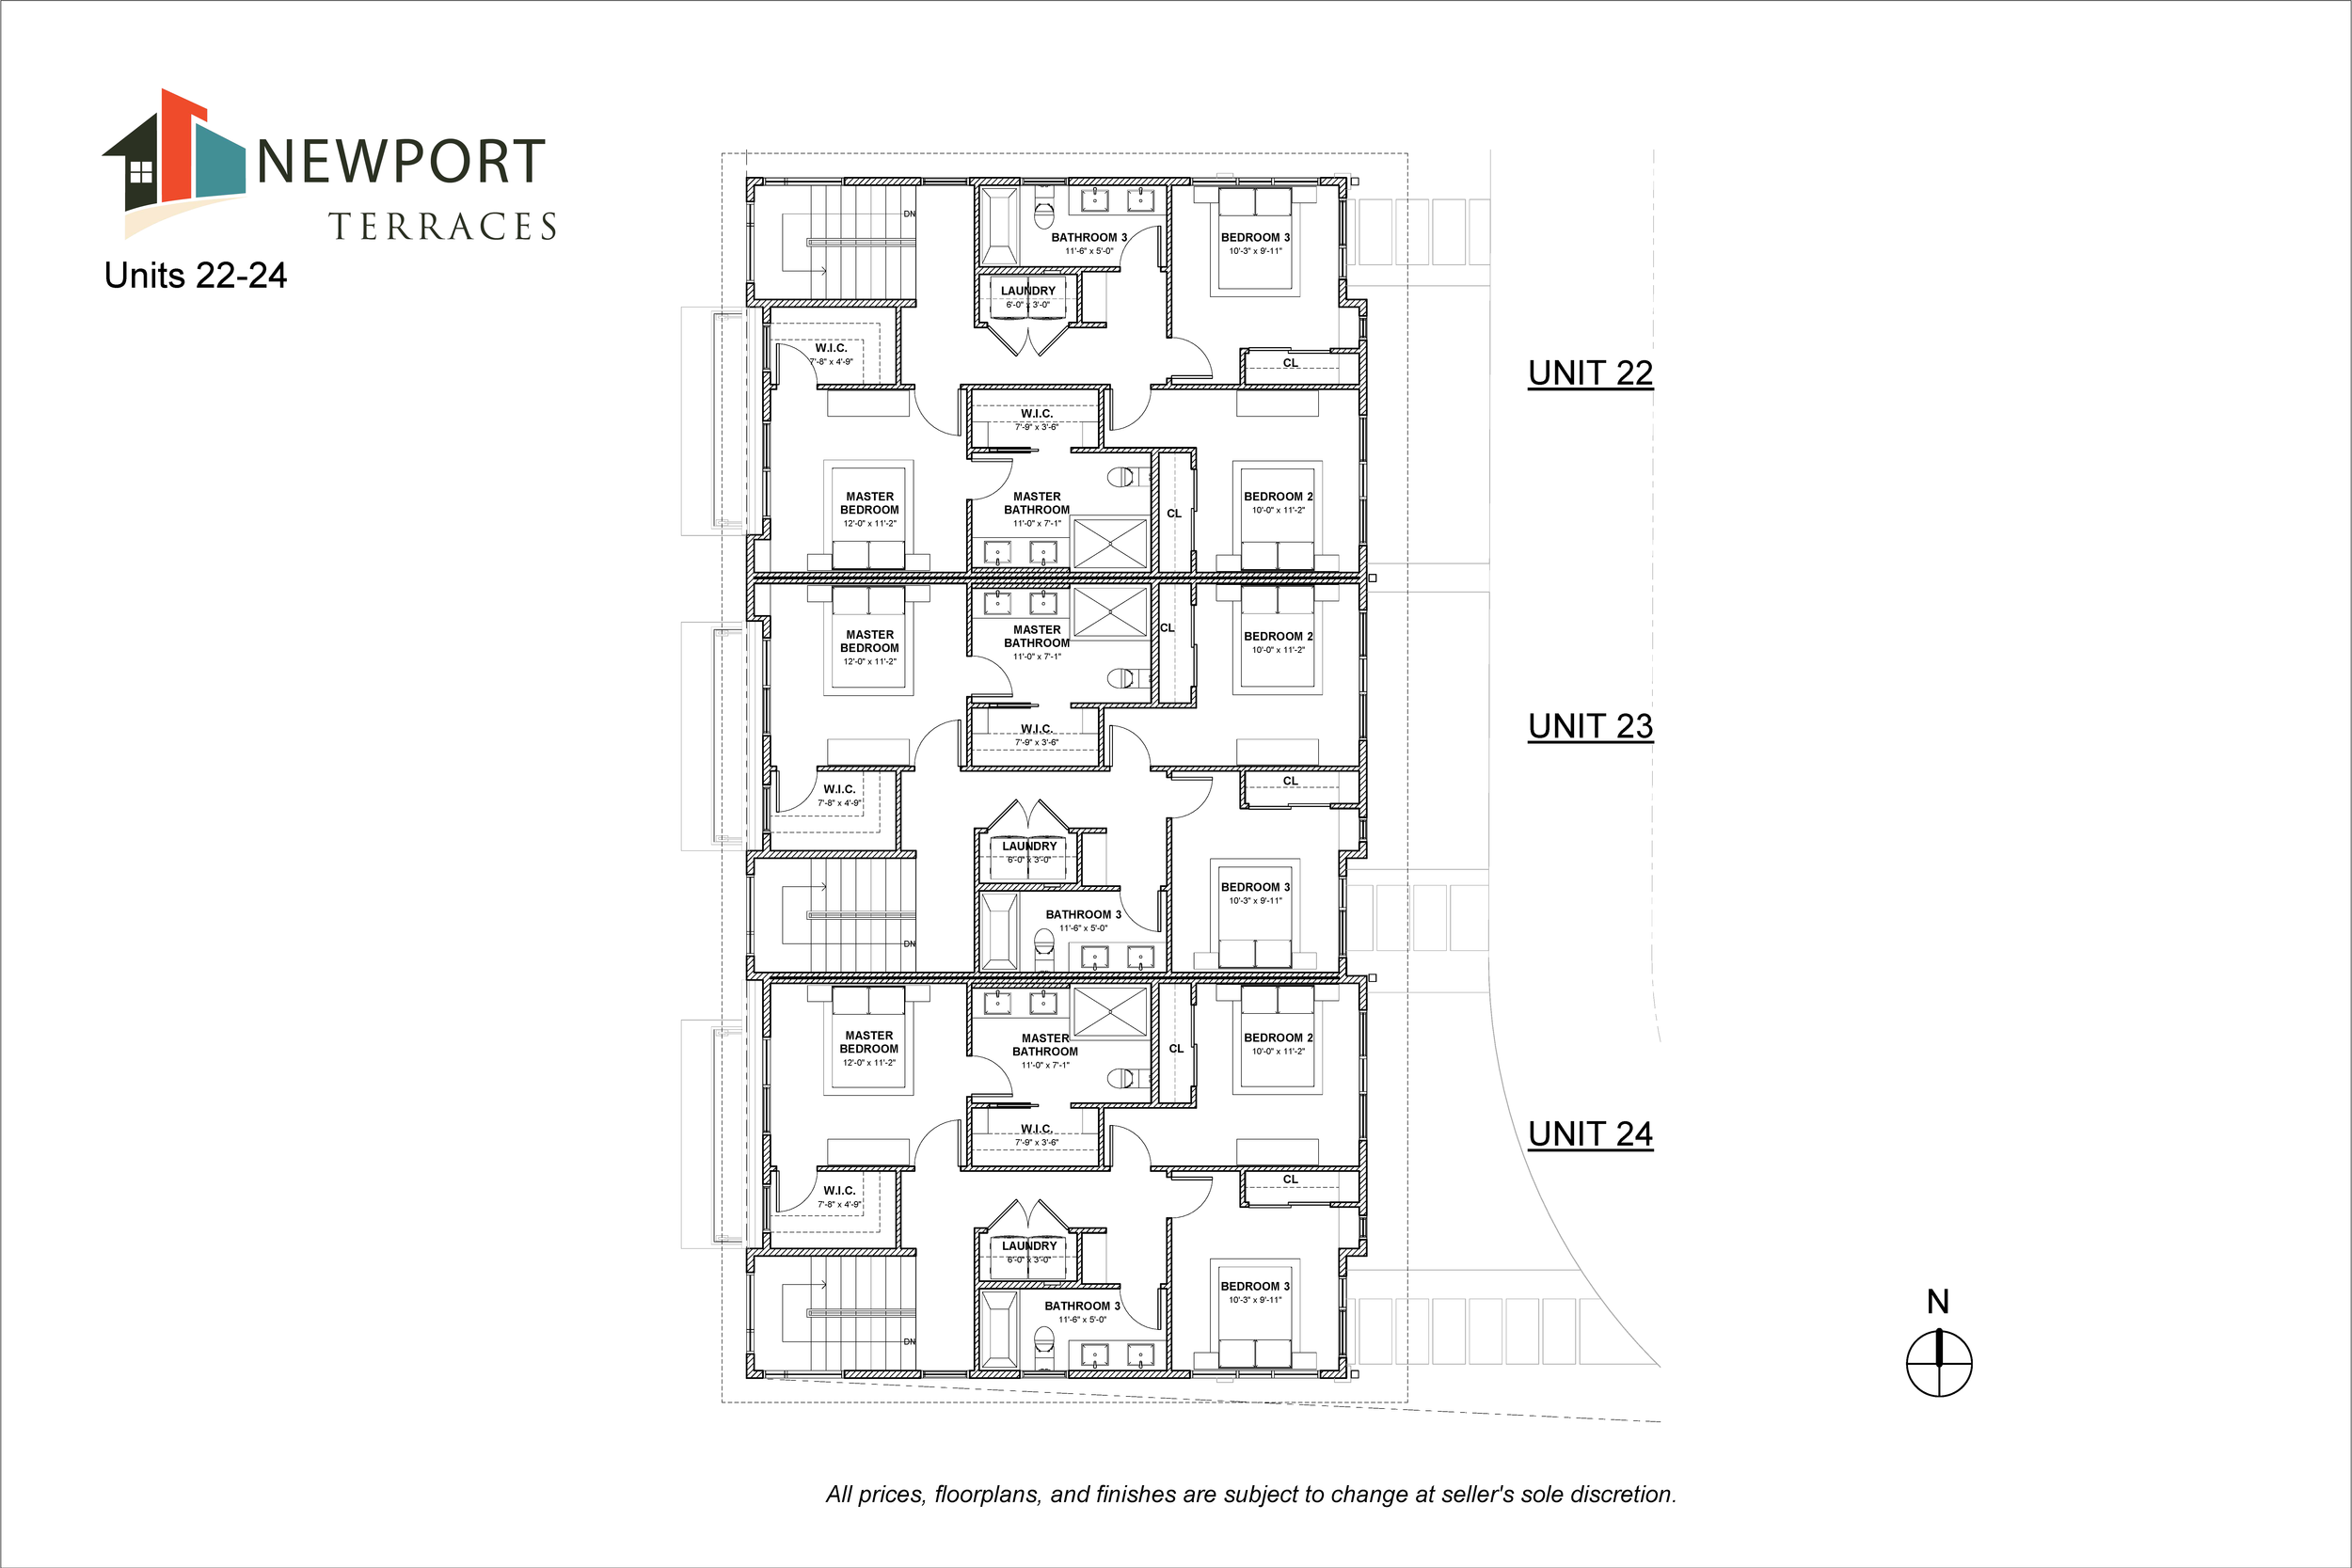 Newport Floorplans L22 L23 L24_Page_4.png